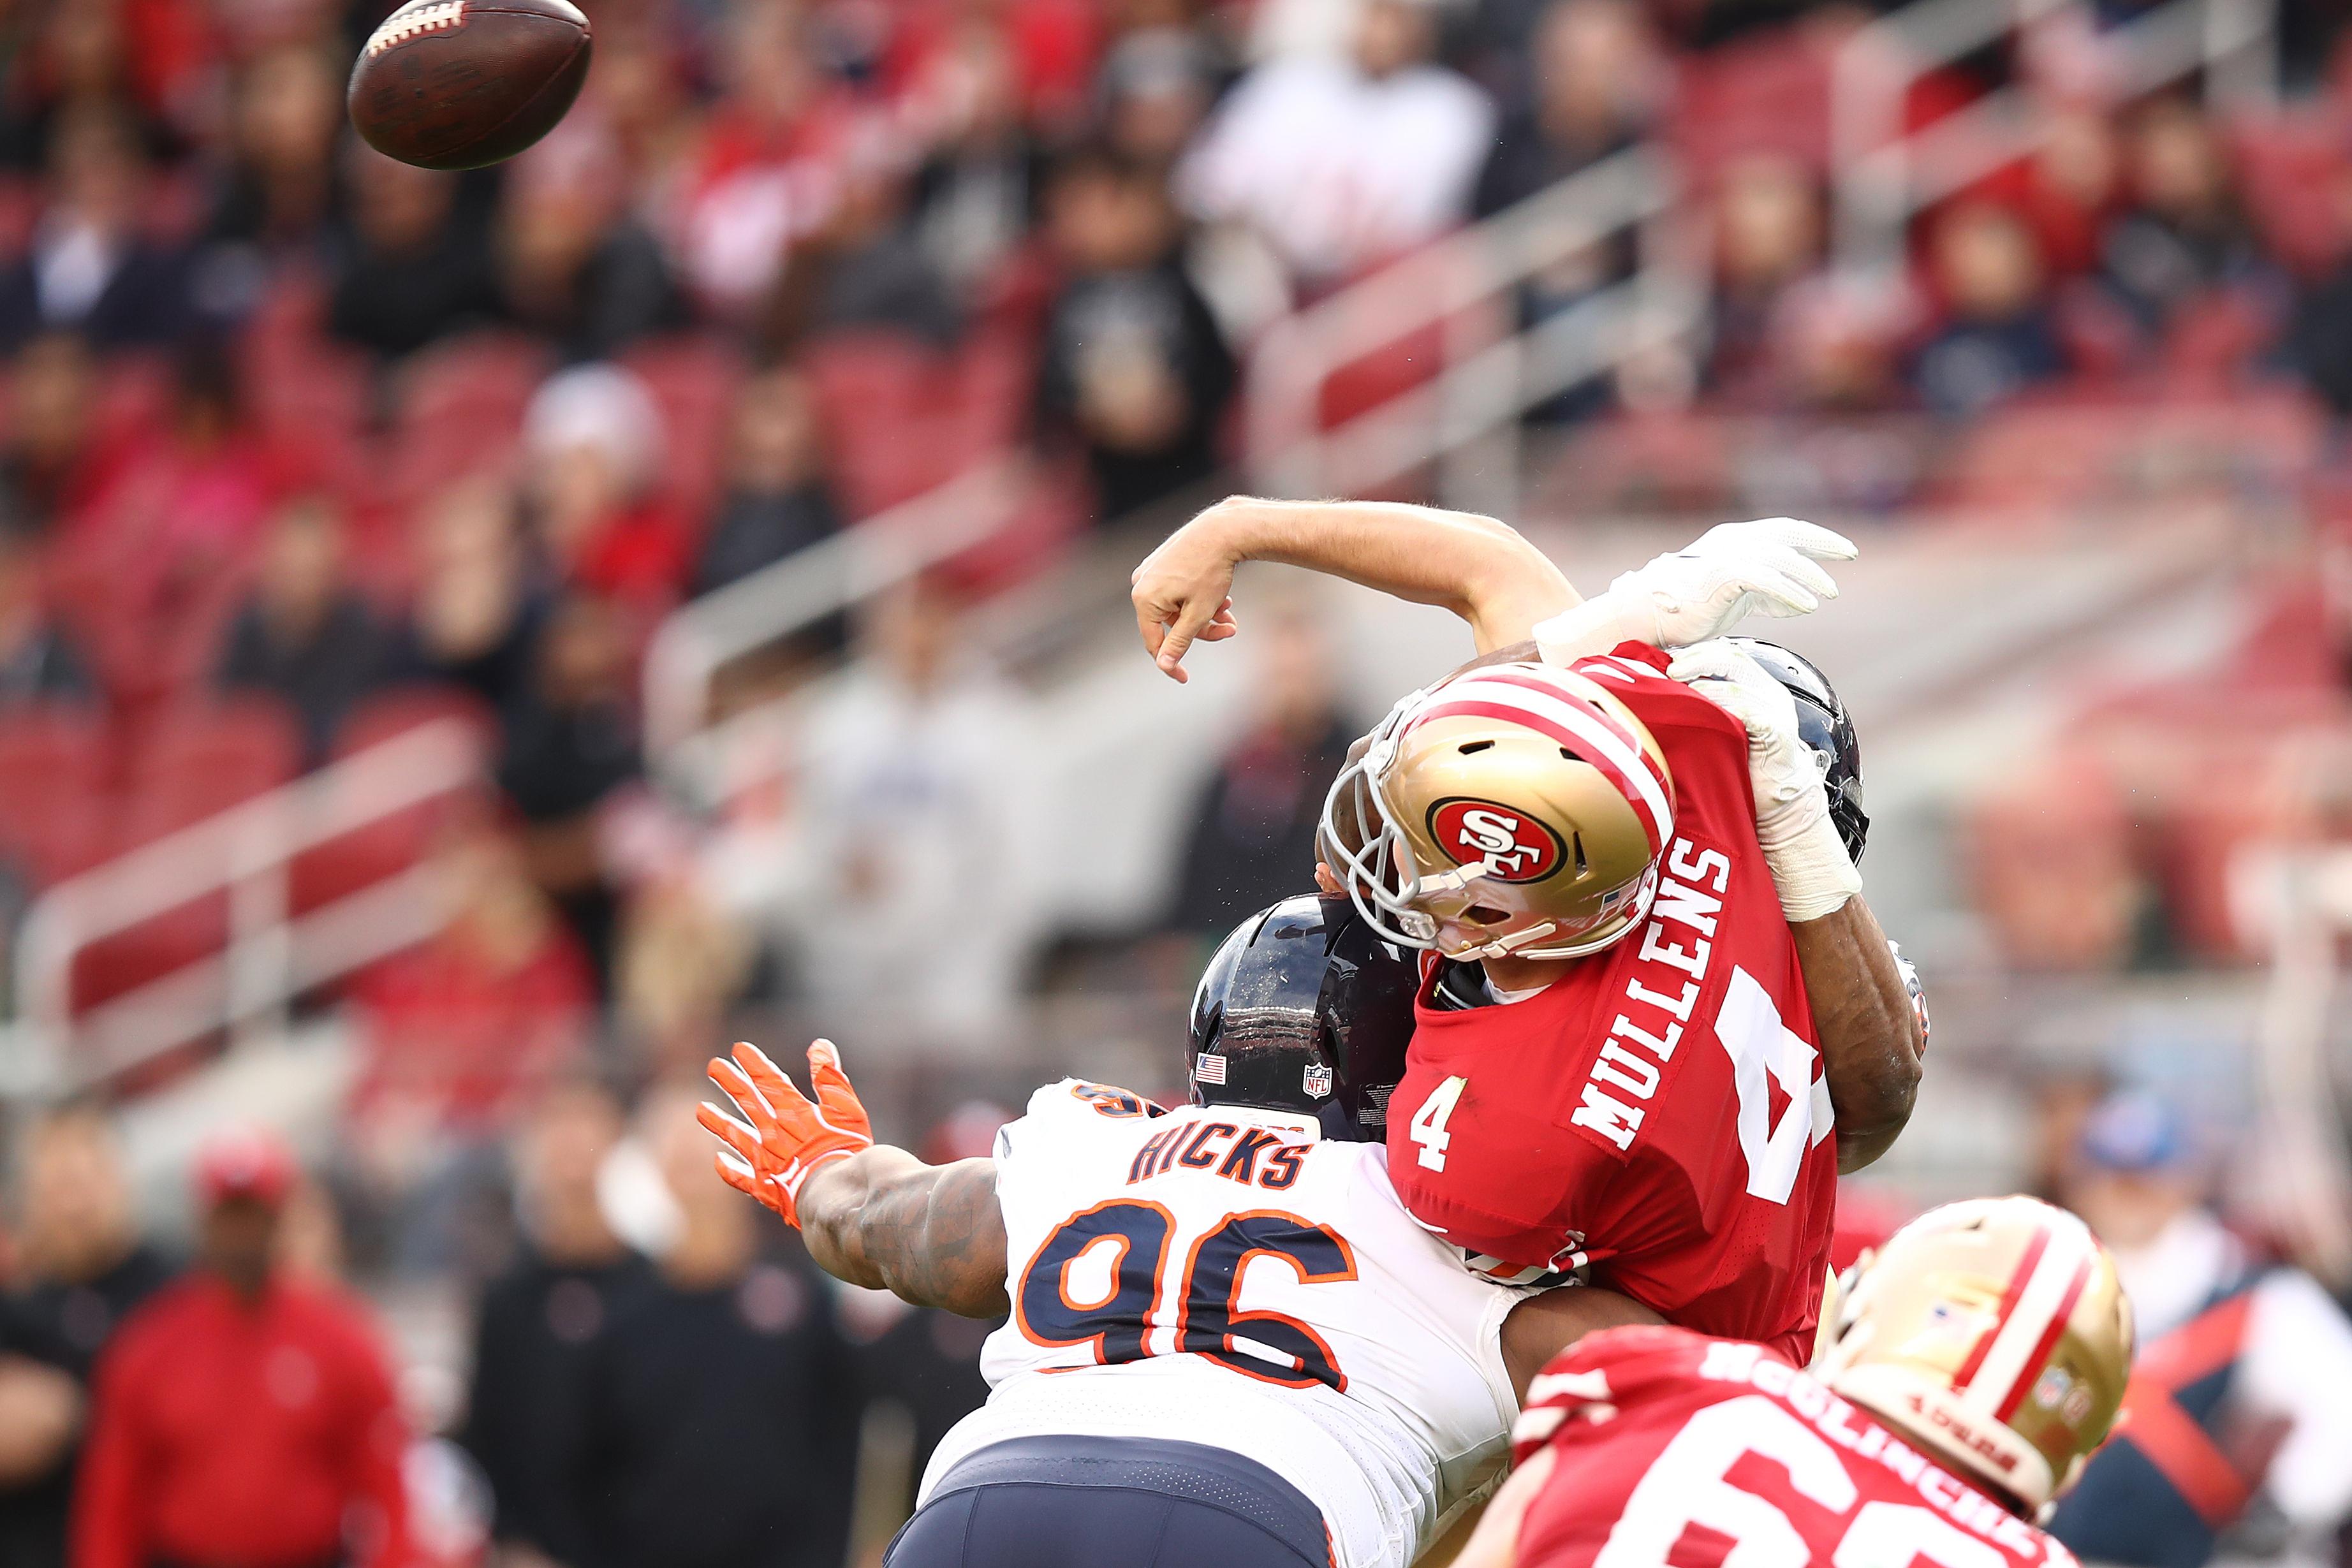 Bears defensive lineman Akiem Hicks sacks then-49ers quarterback Nick Mullens in 2018.